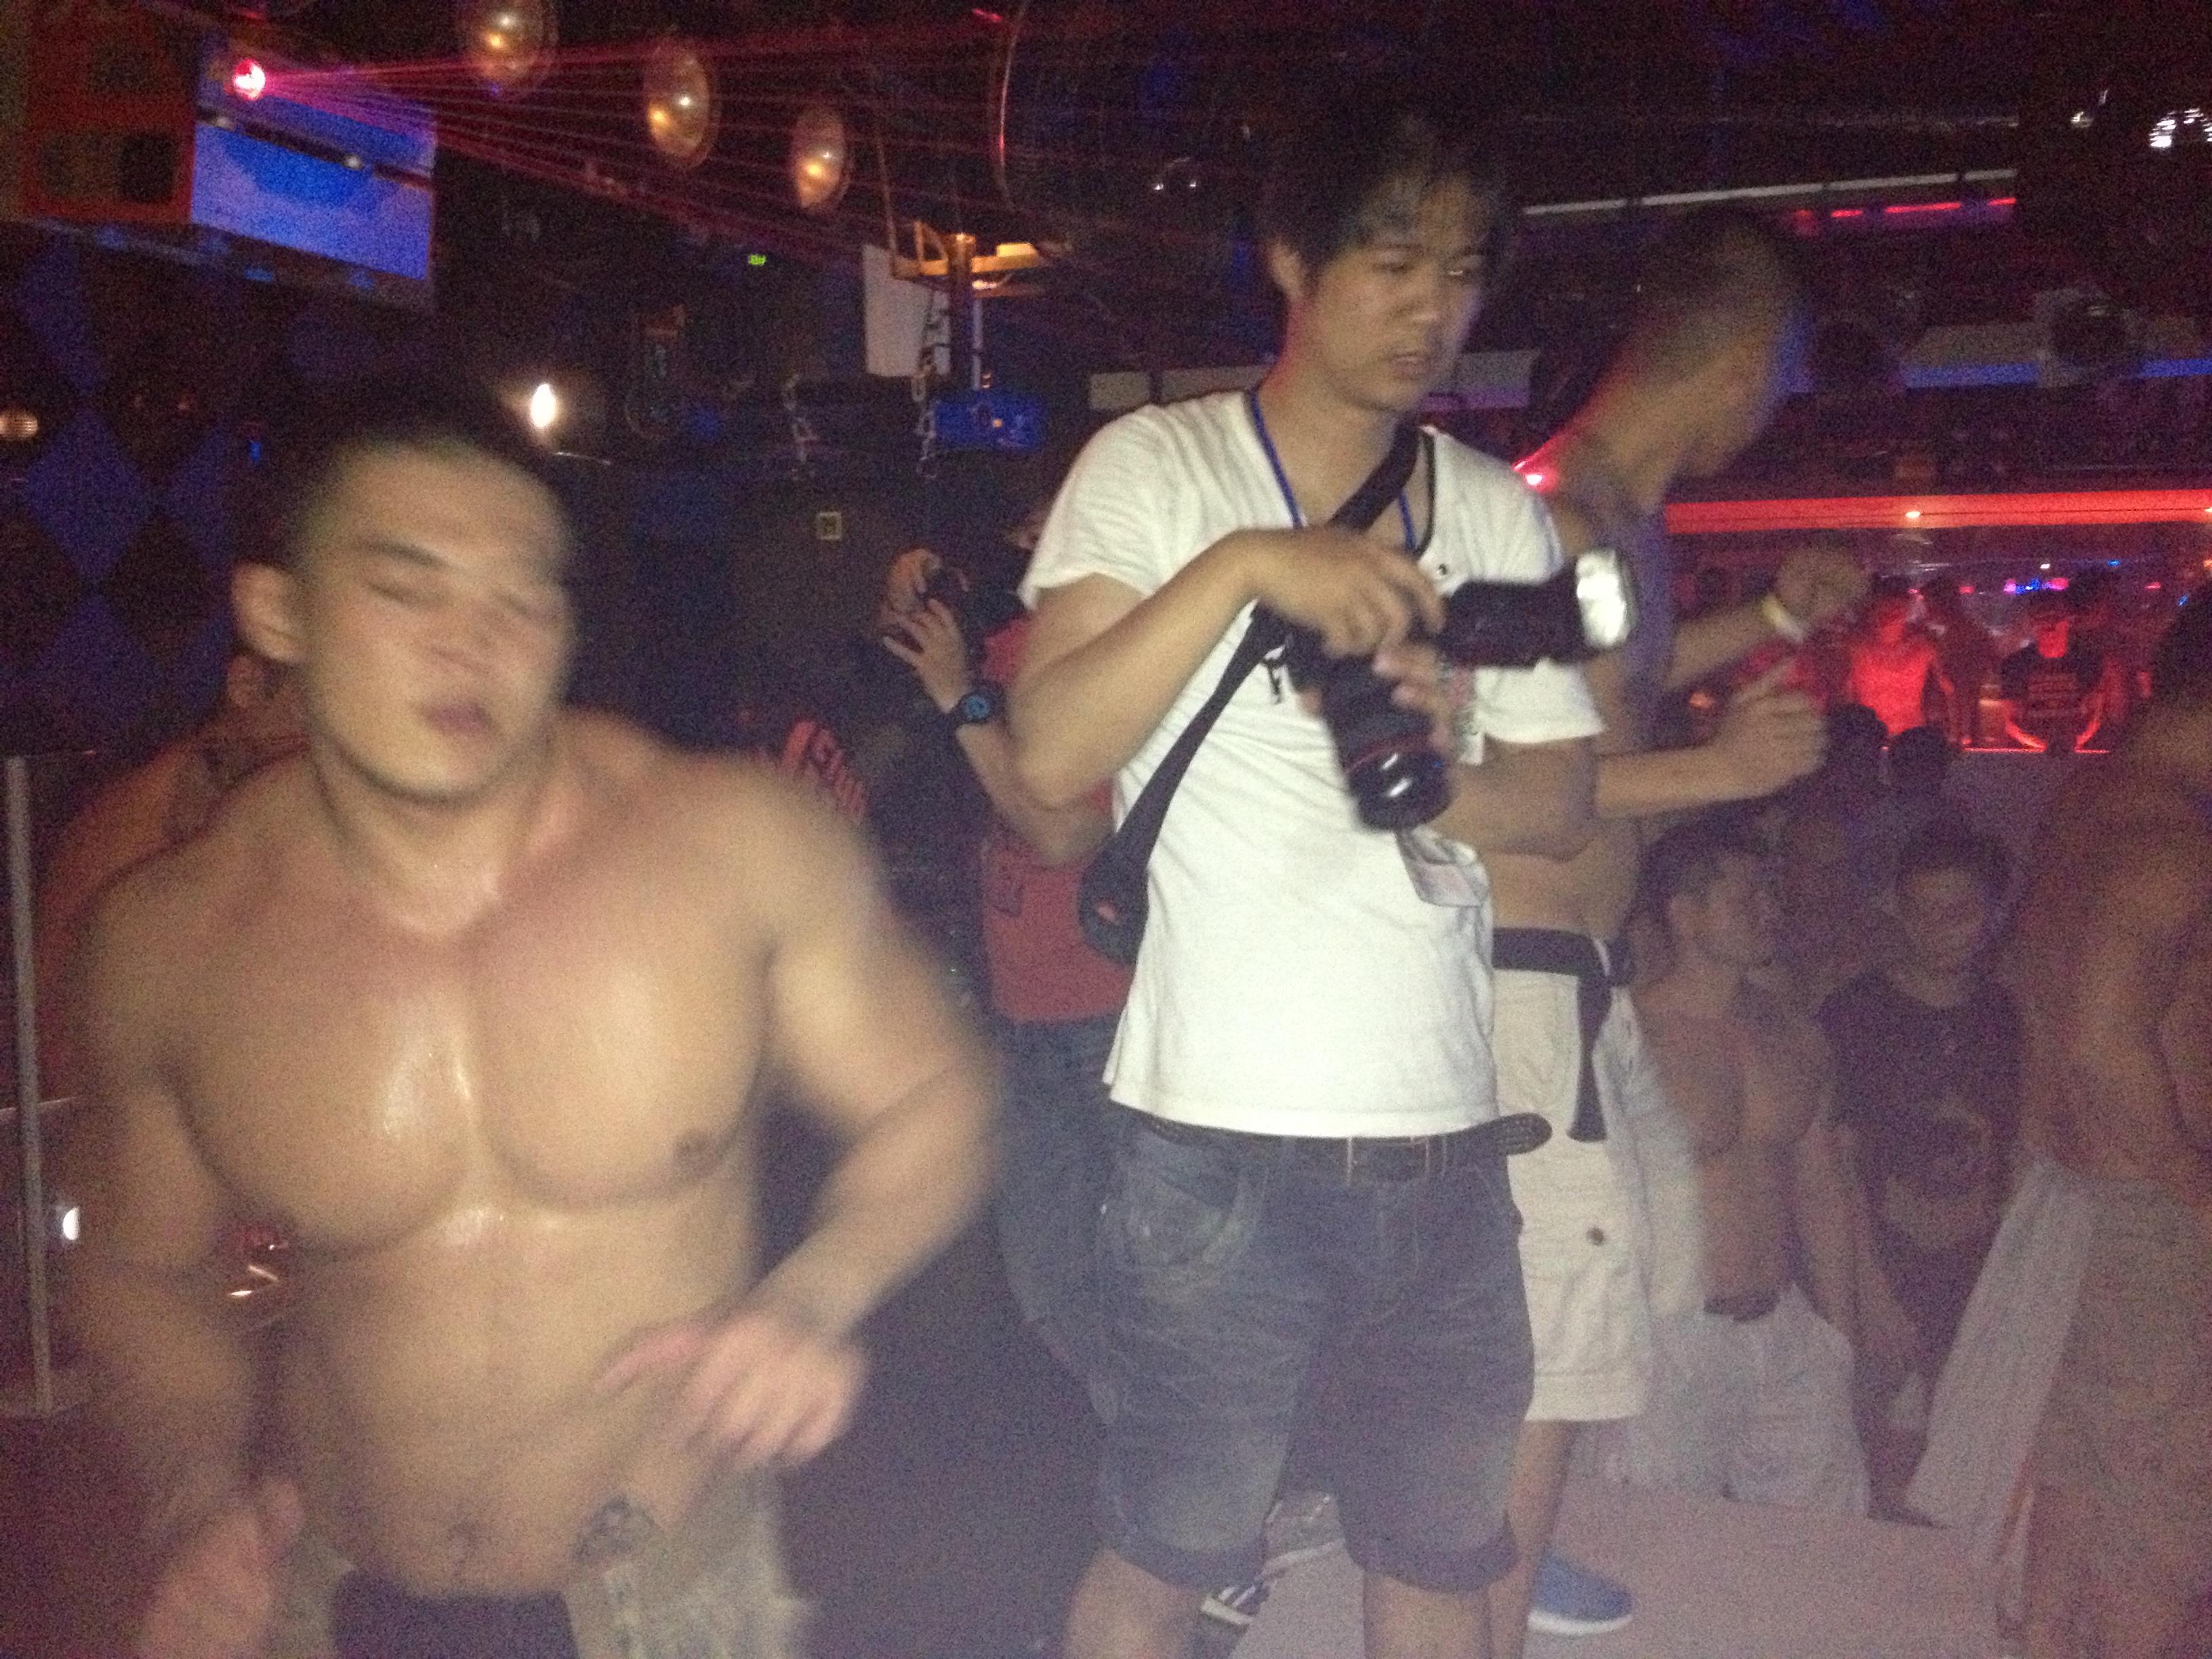 Gay clubs taipei